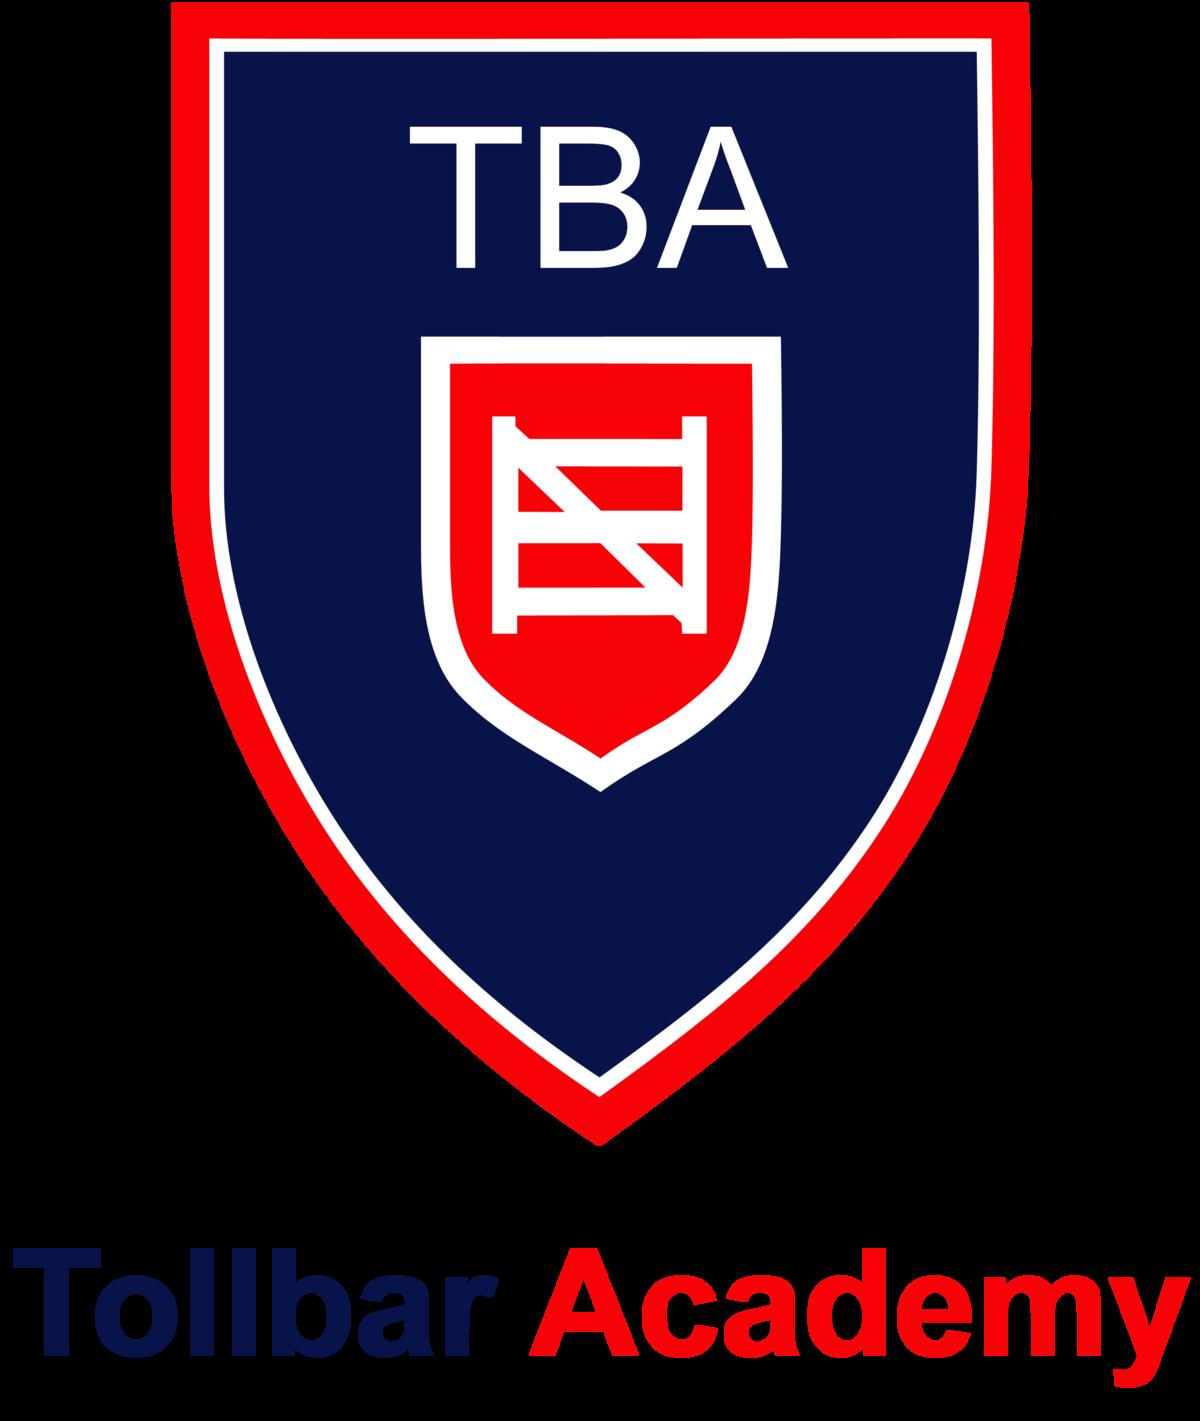 Tollbar Academy Wikipedia